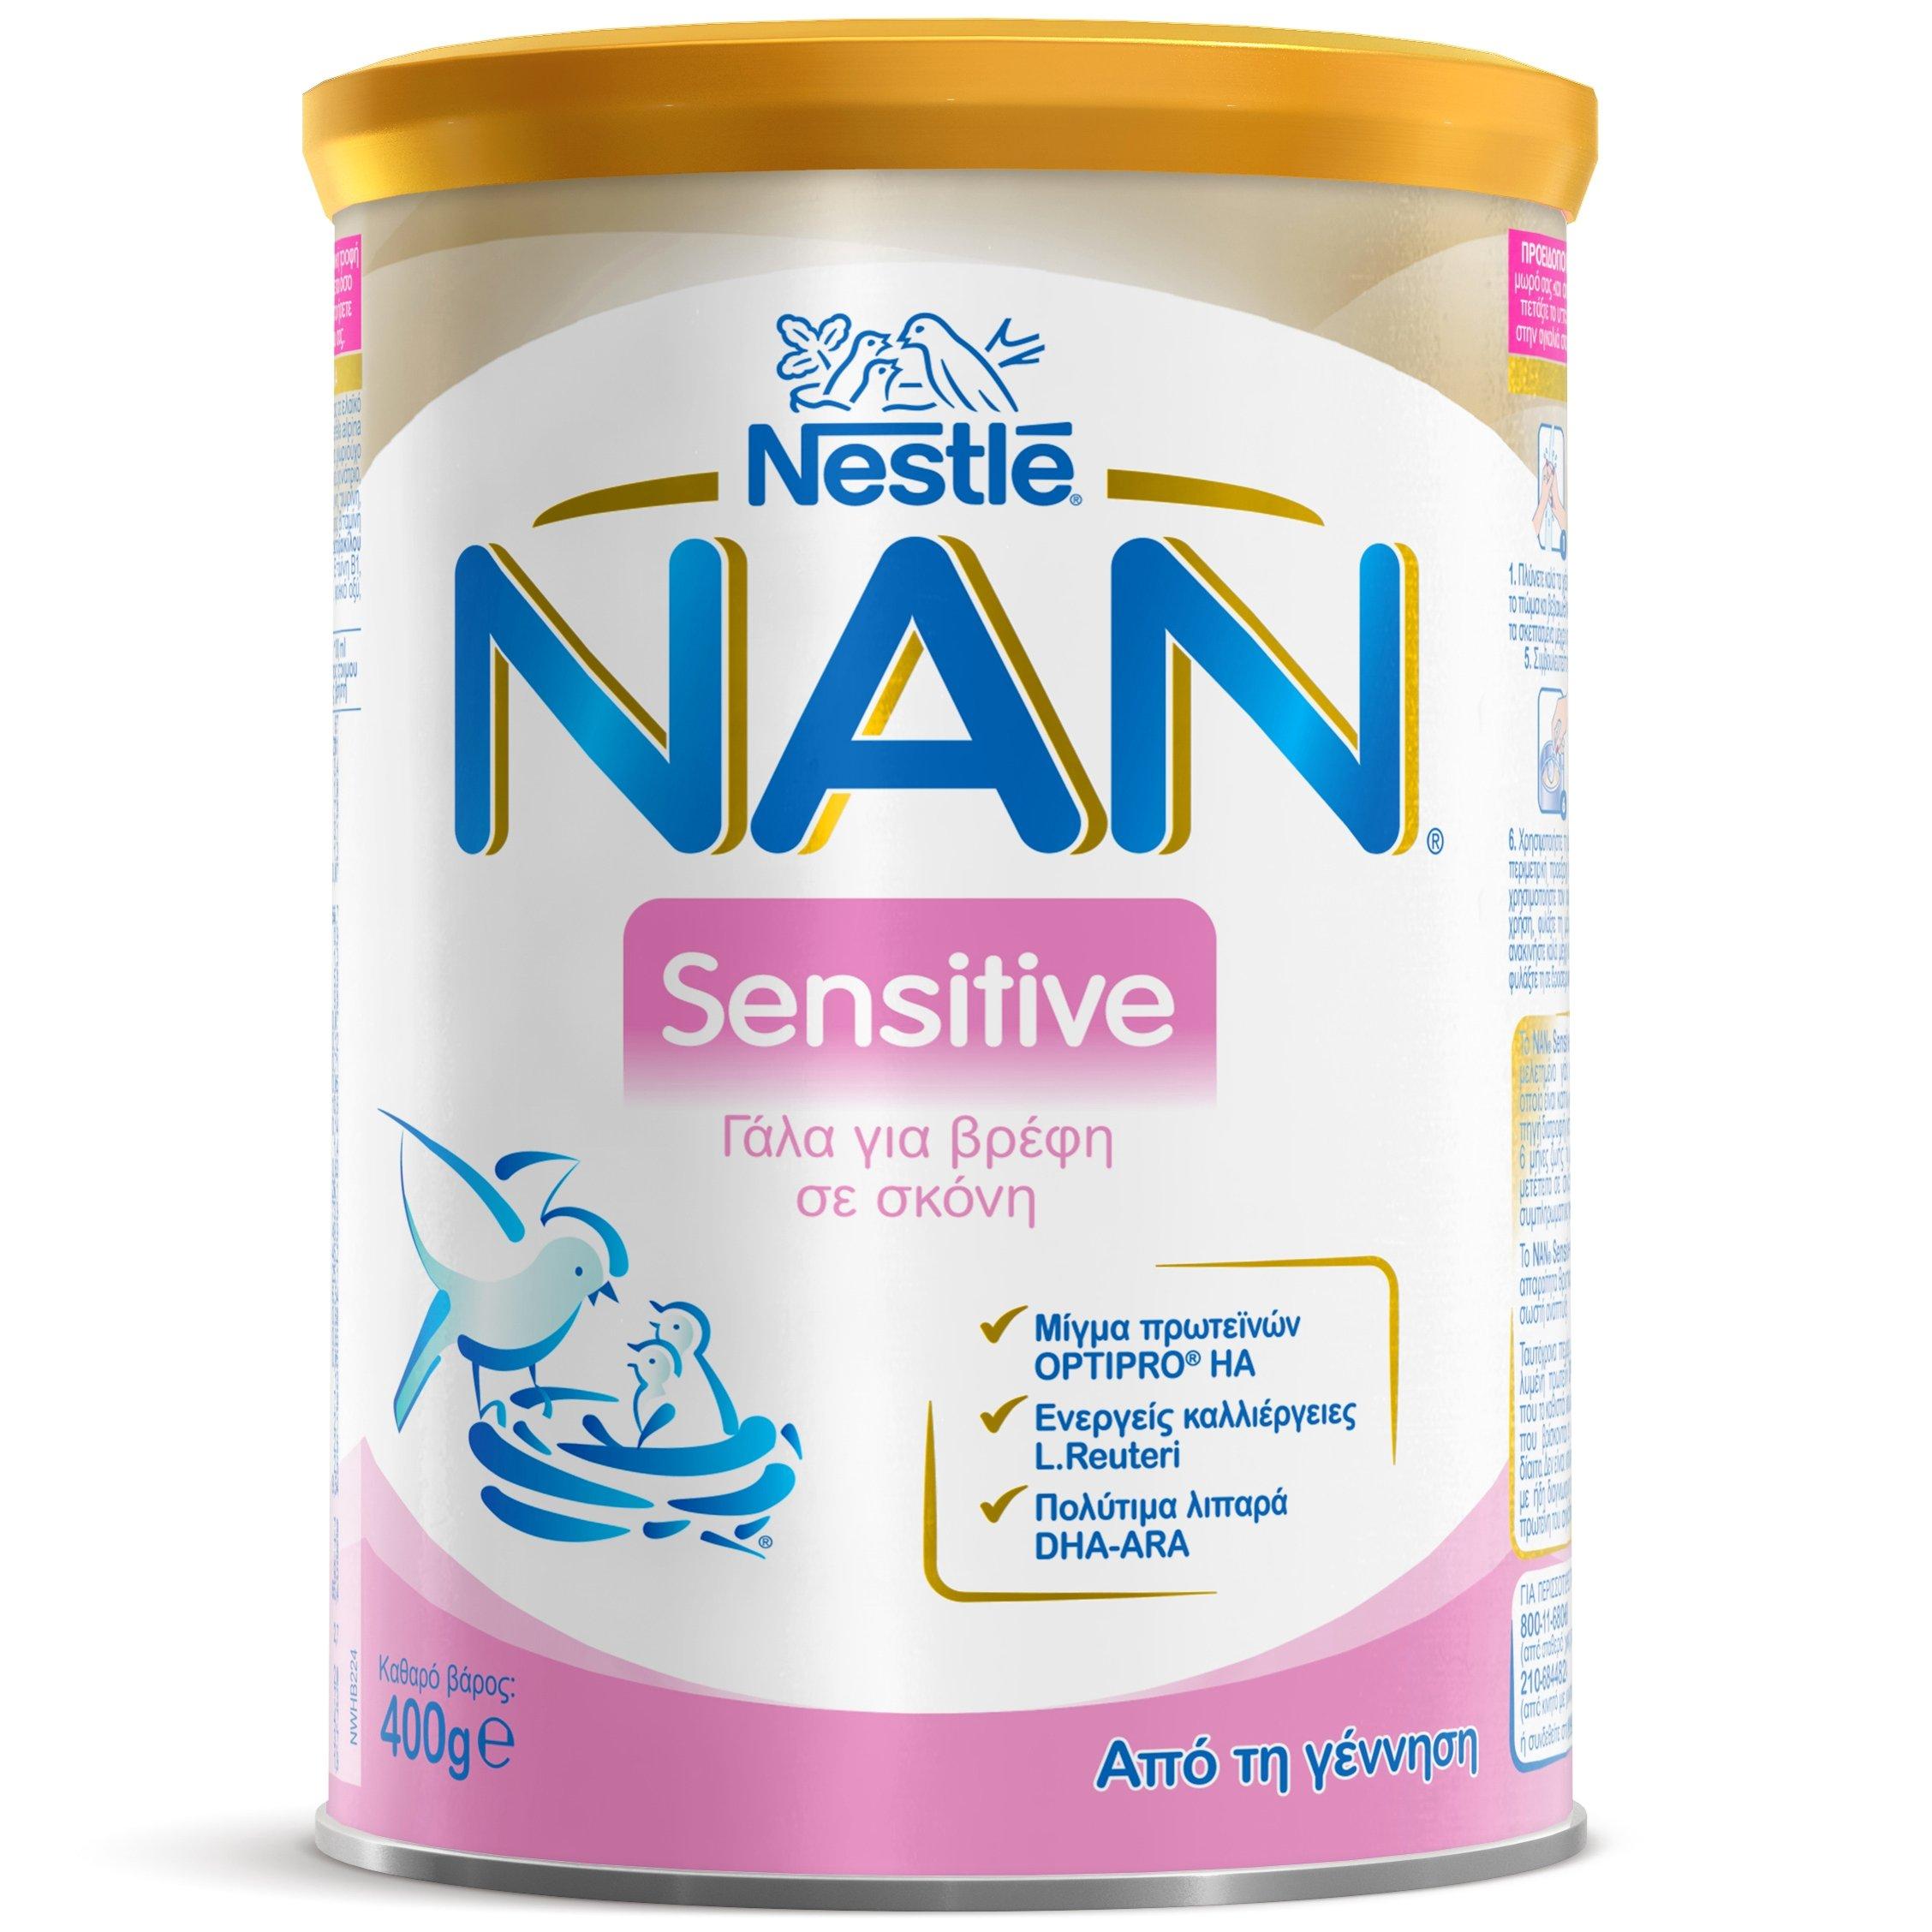 Nestle NAN Sensitive Βρεφικό Γάλα σε Σκόνη με Μειωμένη Λακτόζη, Κατάλληλο Από τη Γέννηση 400gr